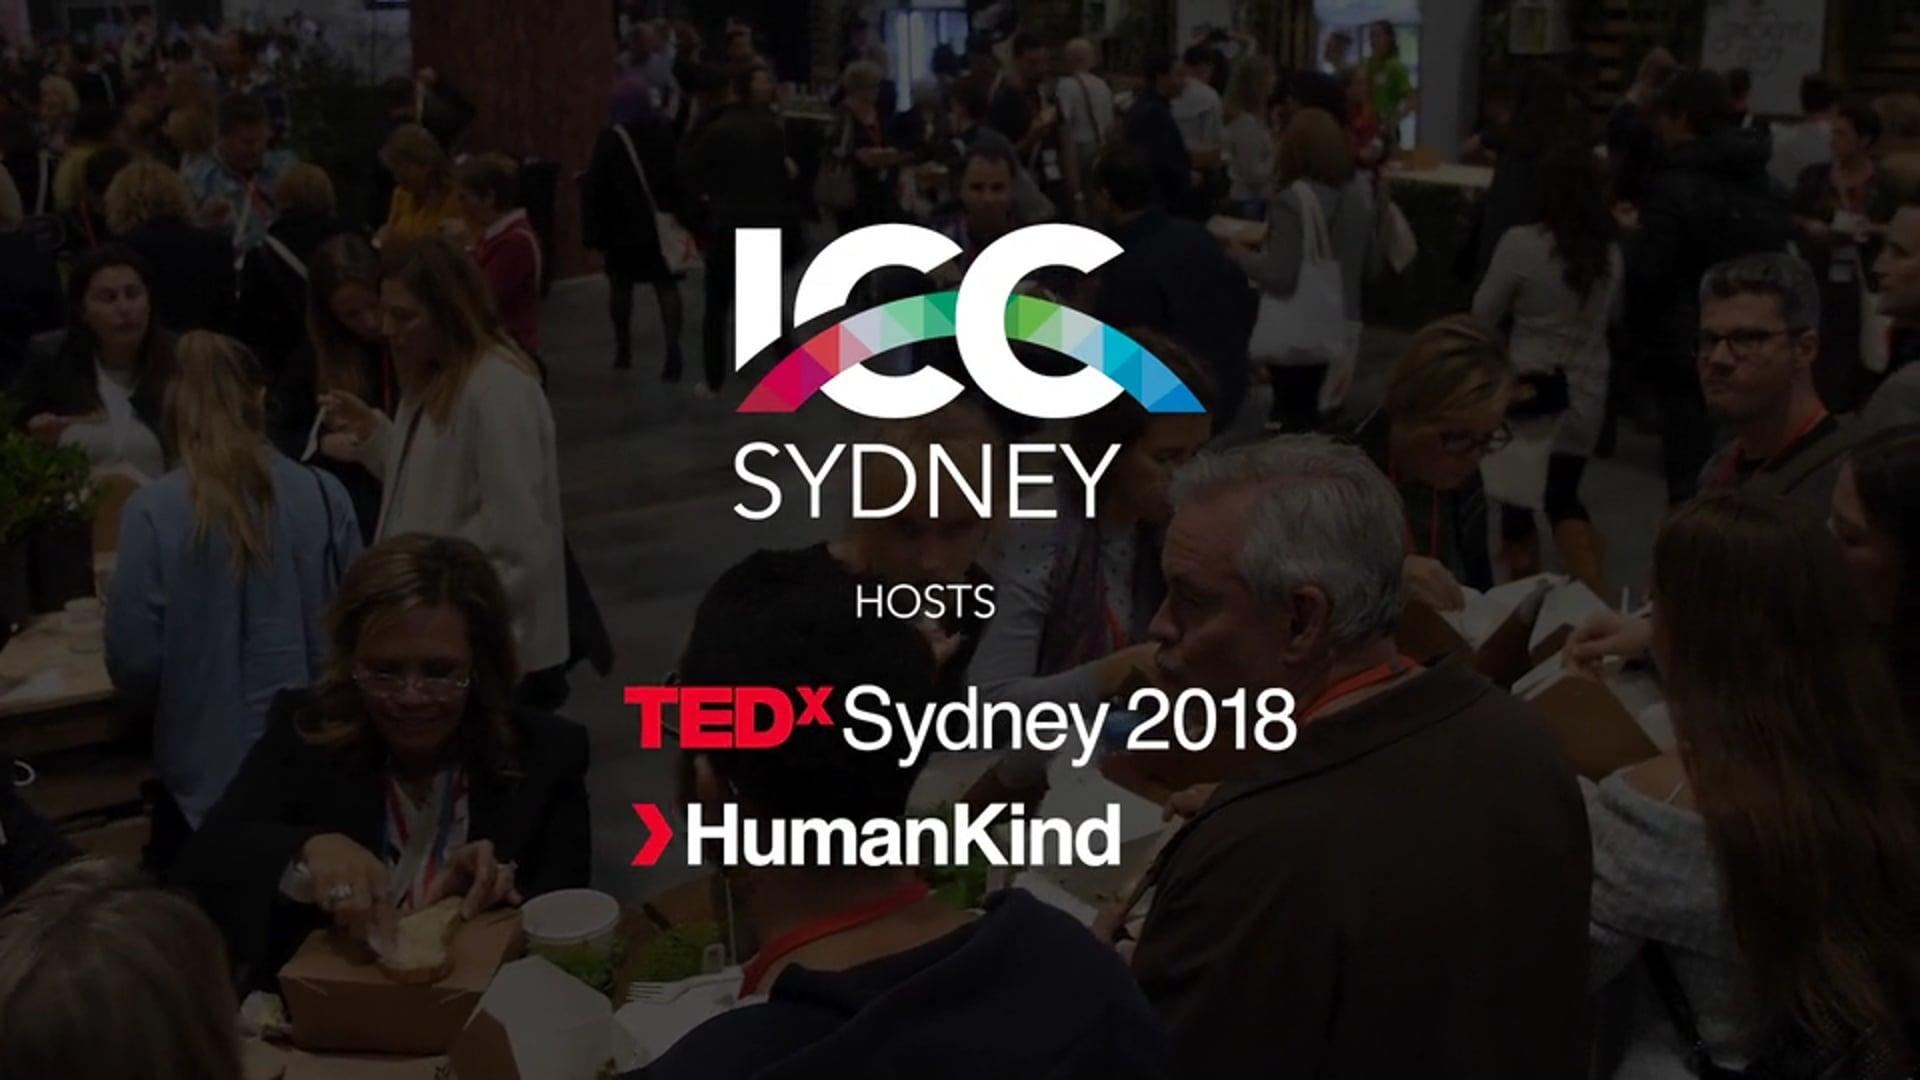 ICC Sydney - TEDx Sydney 2018